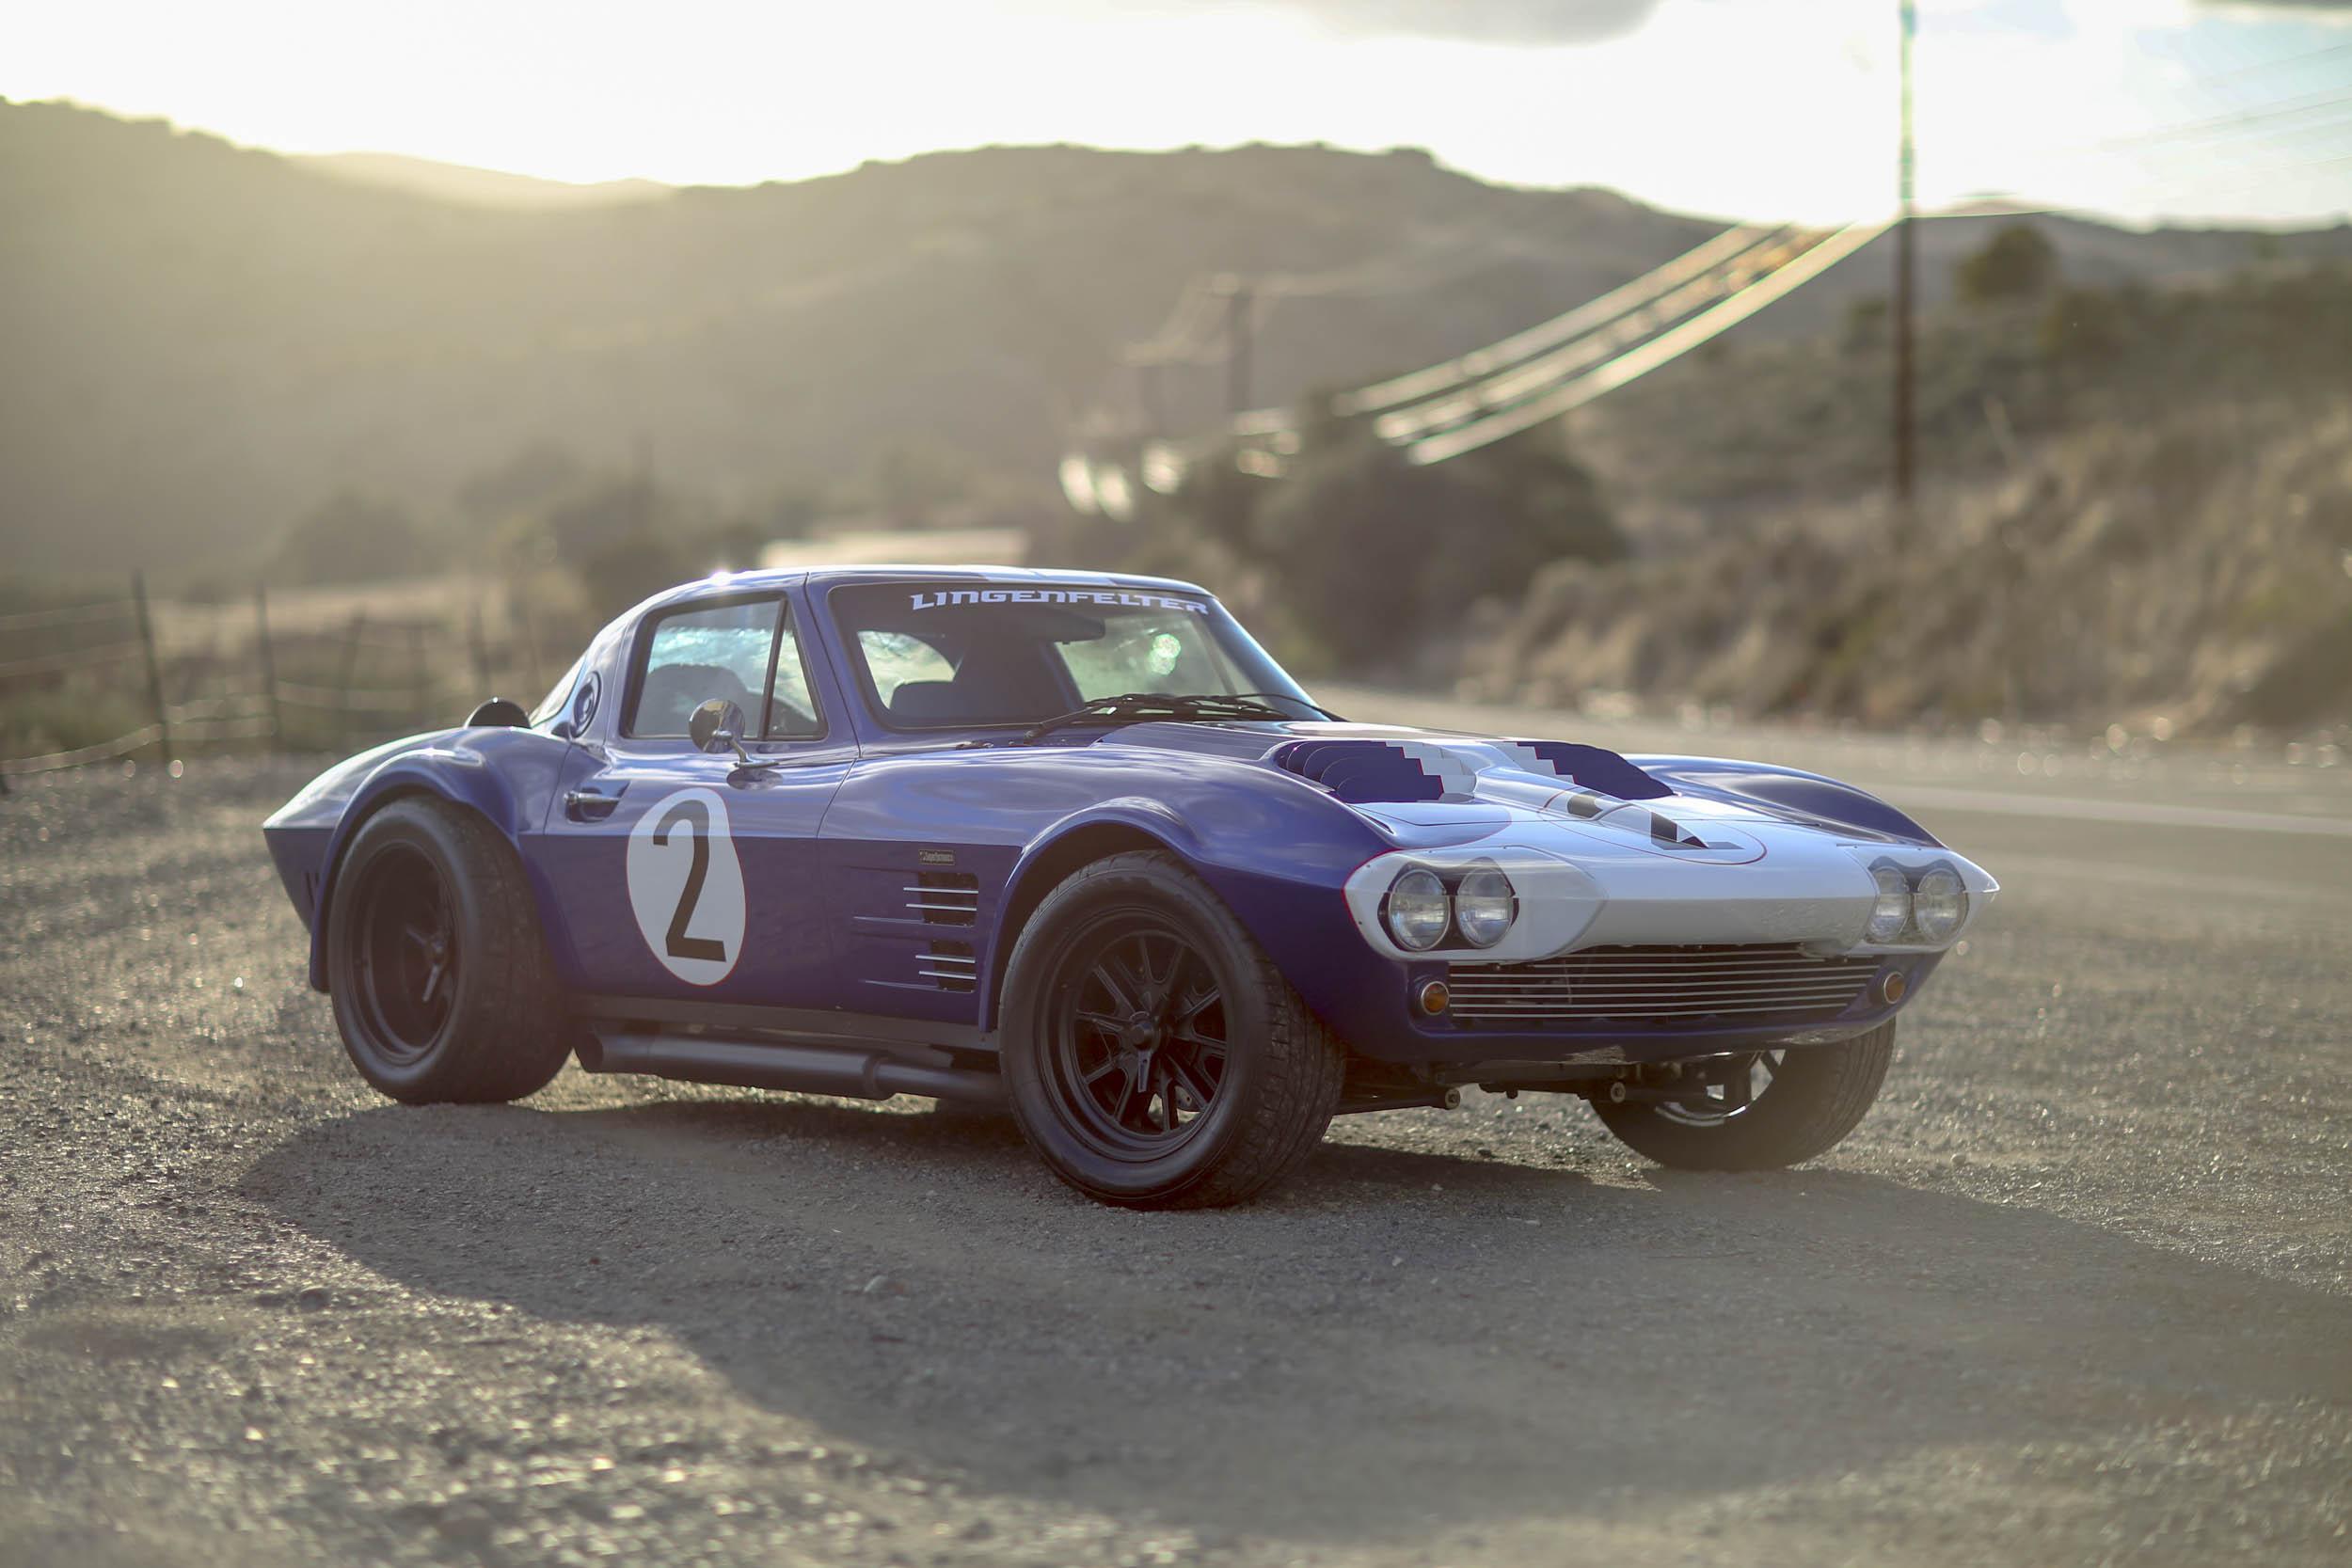 Superformance Corvette Grand Sport front 3/4